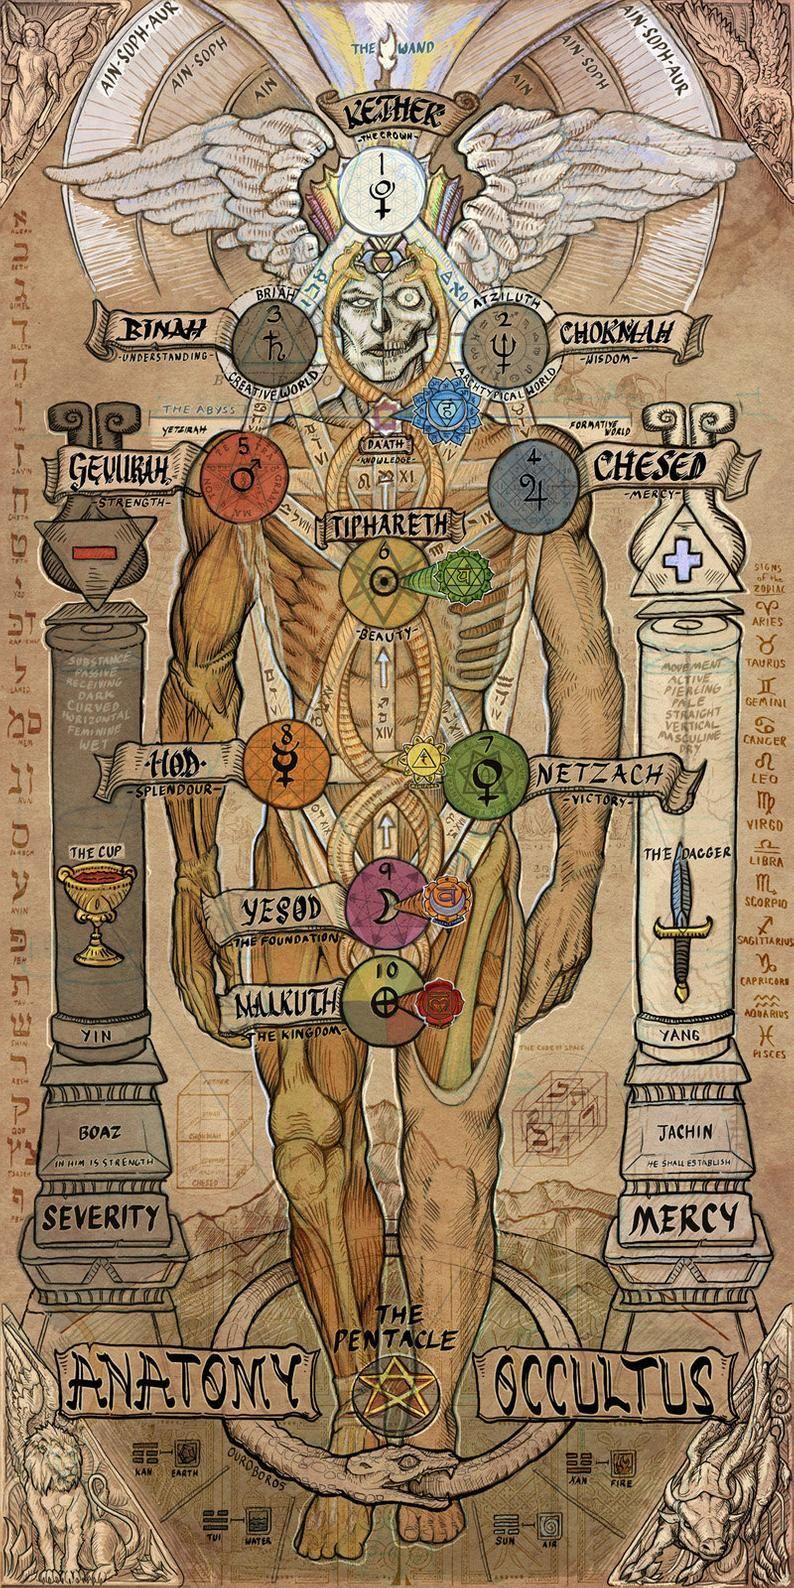 Anatomy Occultus - 9x18